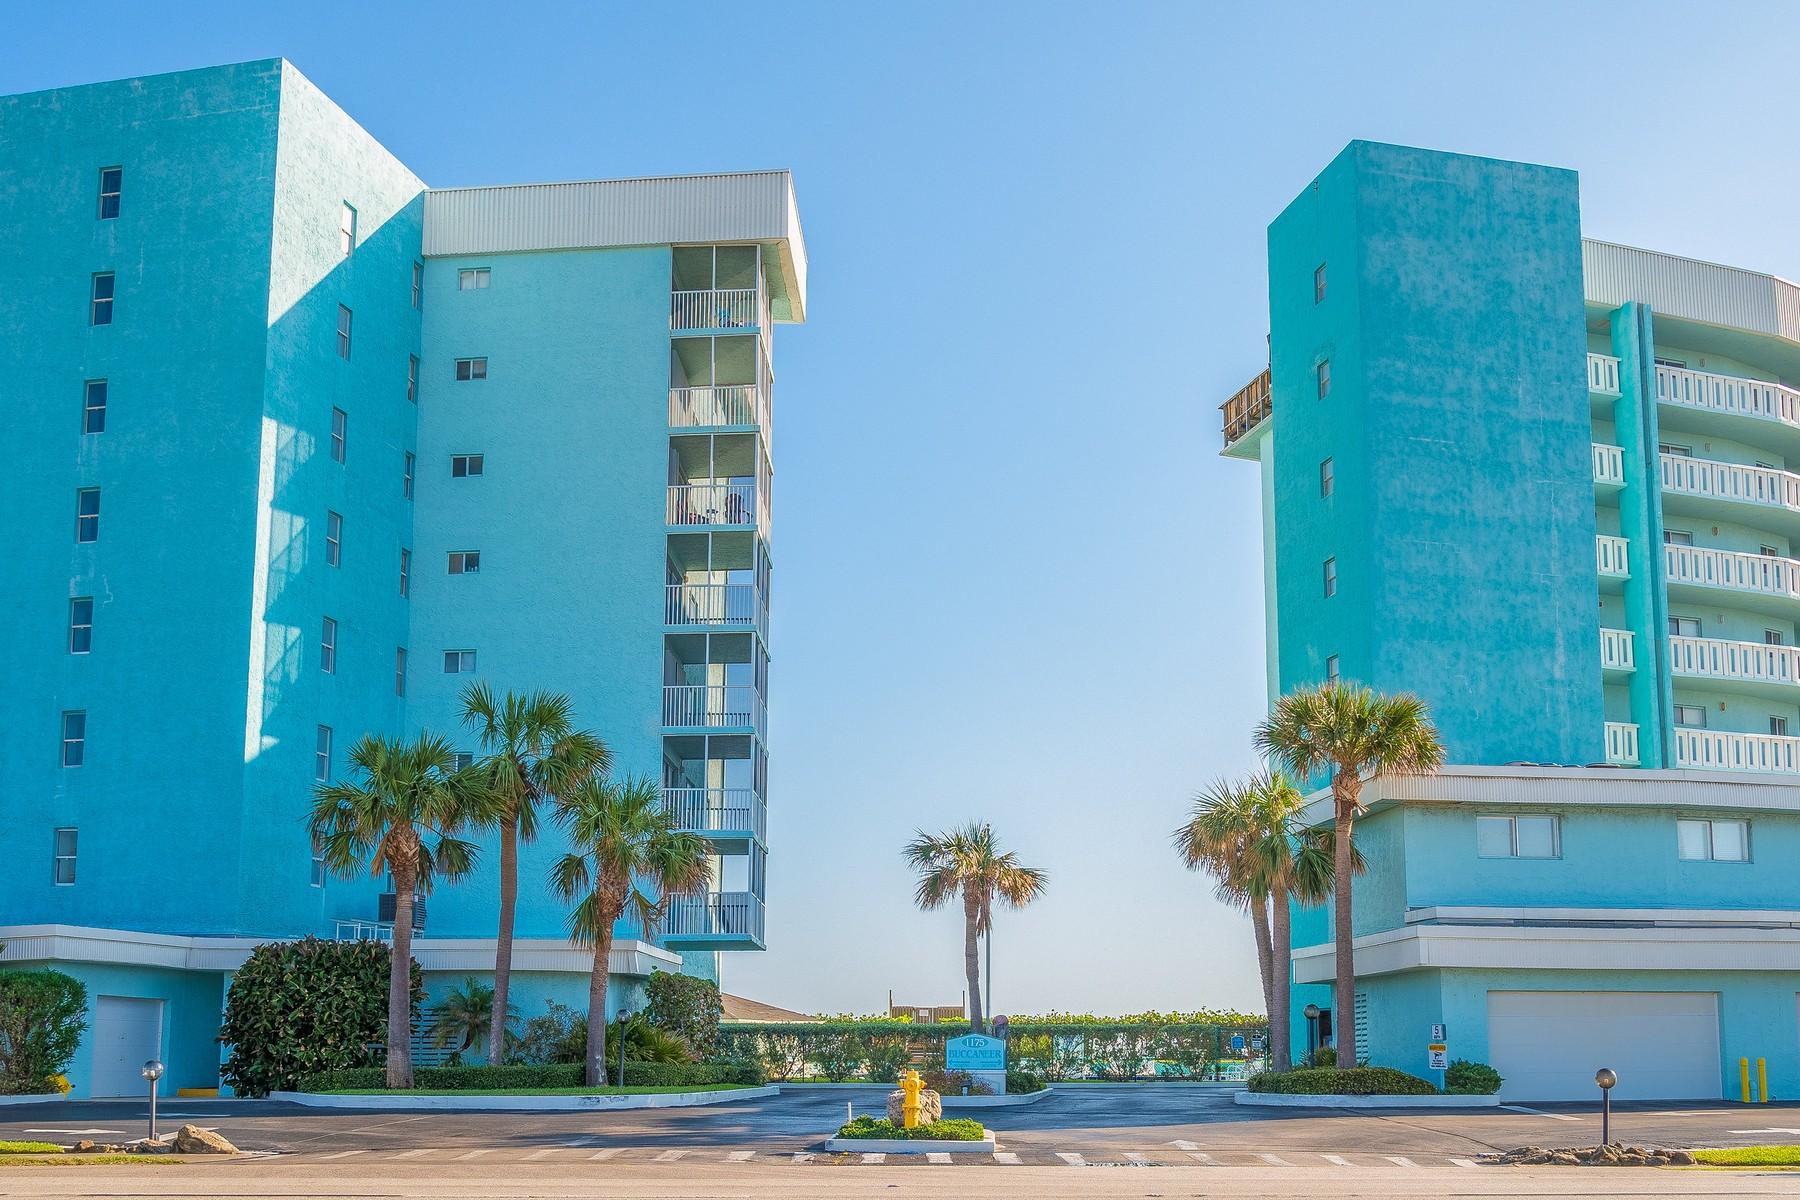 Nhà chung cư vì Bán tại Buccaneer Condo 1175 Highway A1A #208 Satellite Beach, Florida, 32937 Hoa Kỳ